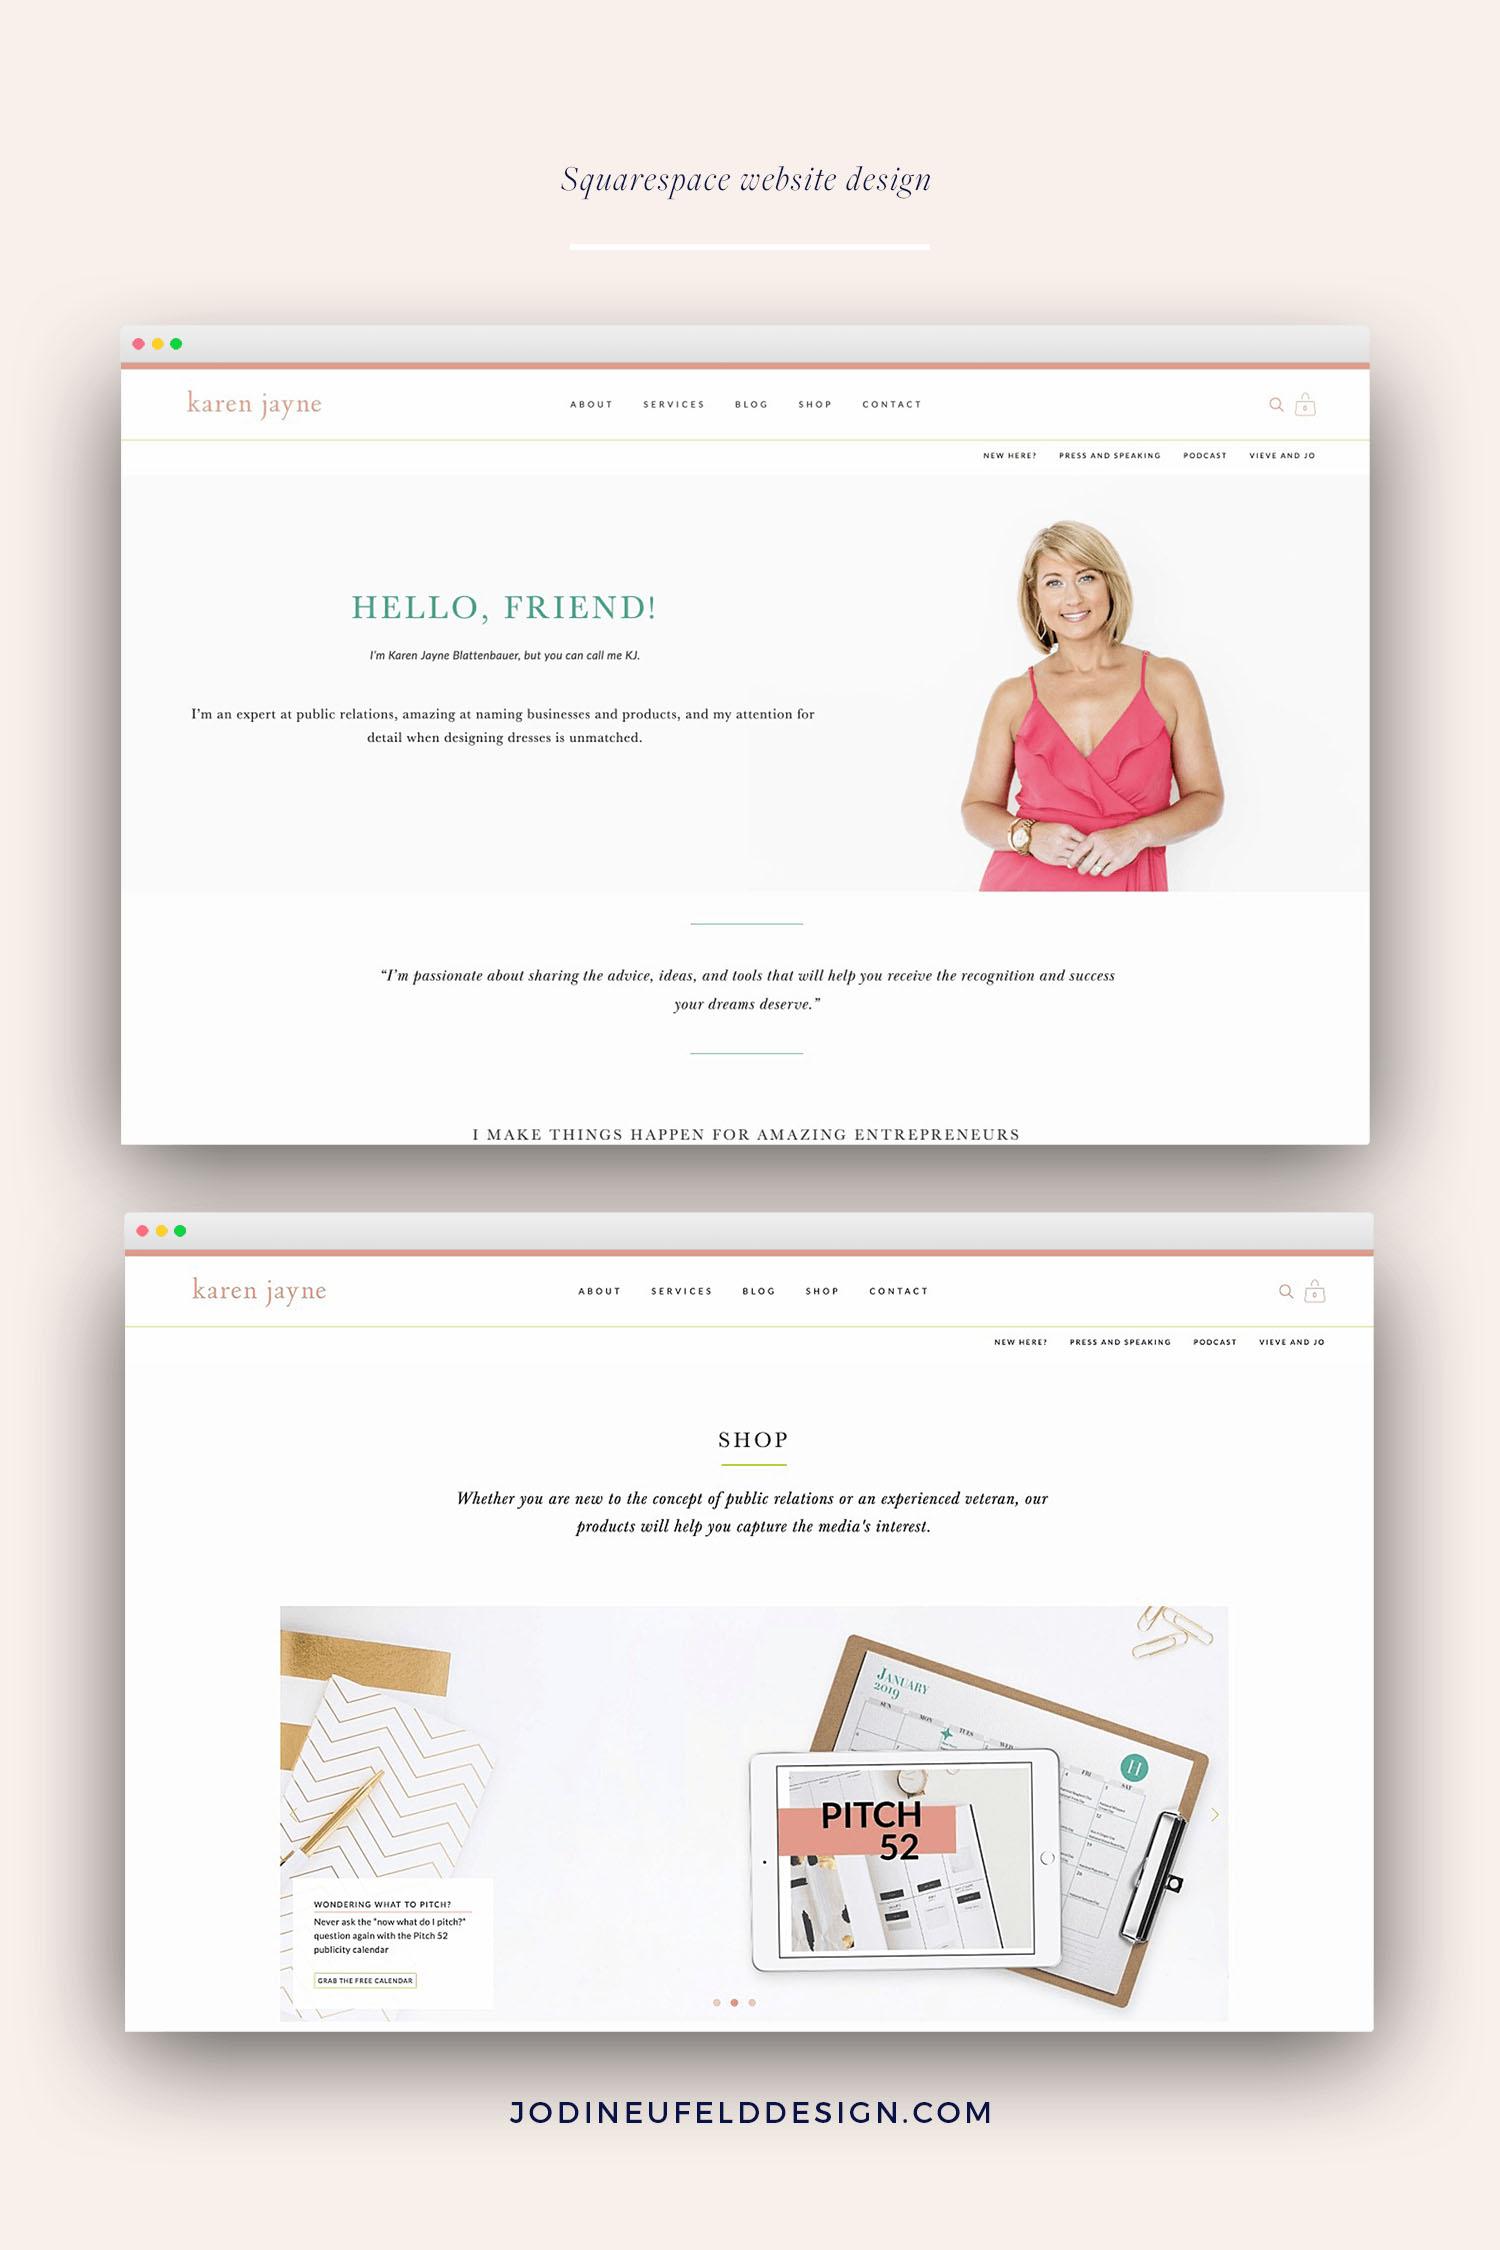 KJ Blattenbauer website design for a PR and business strategist by Jodi Neufeld Design